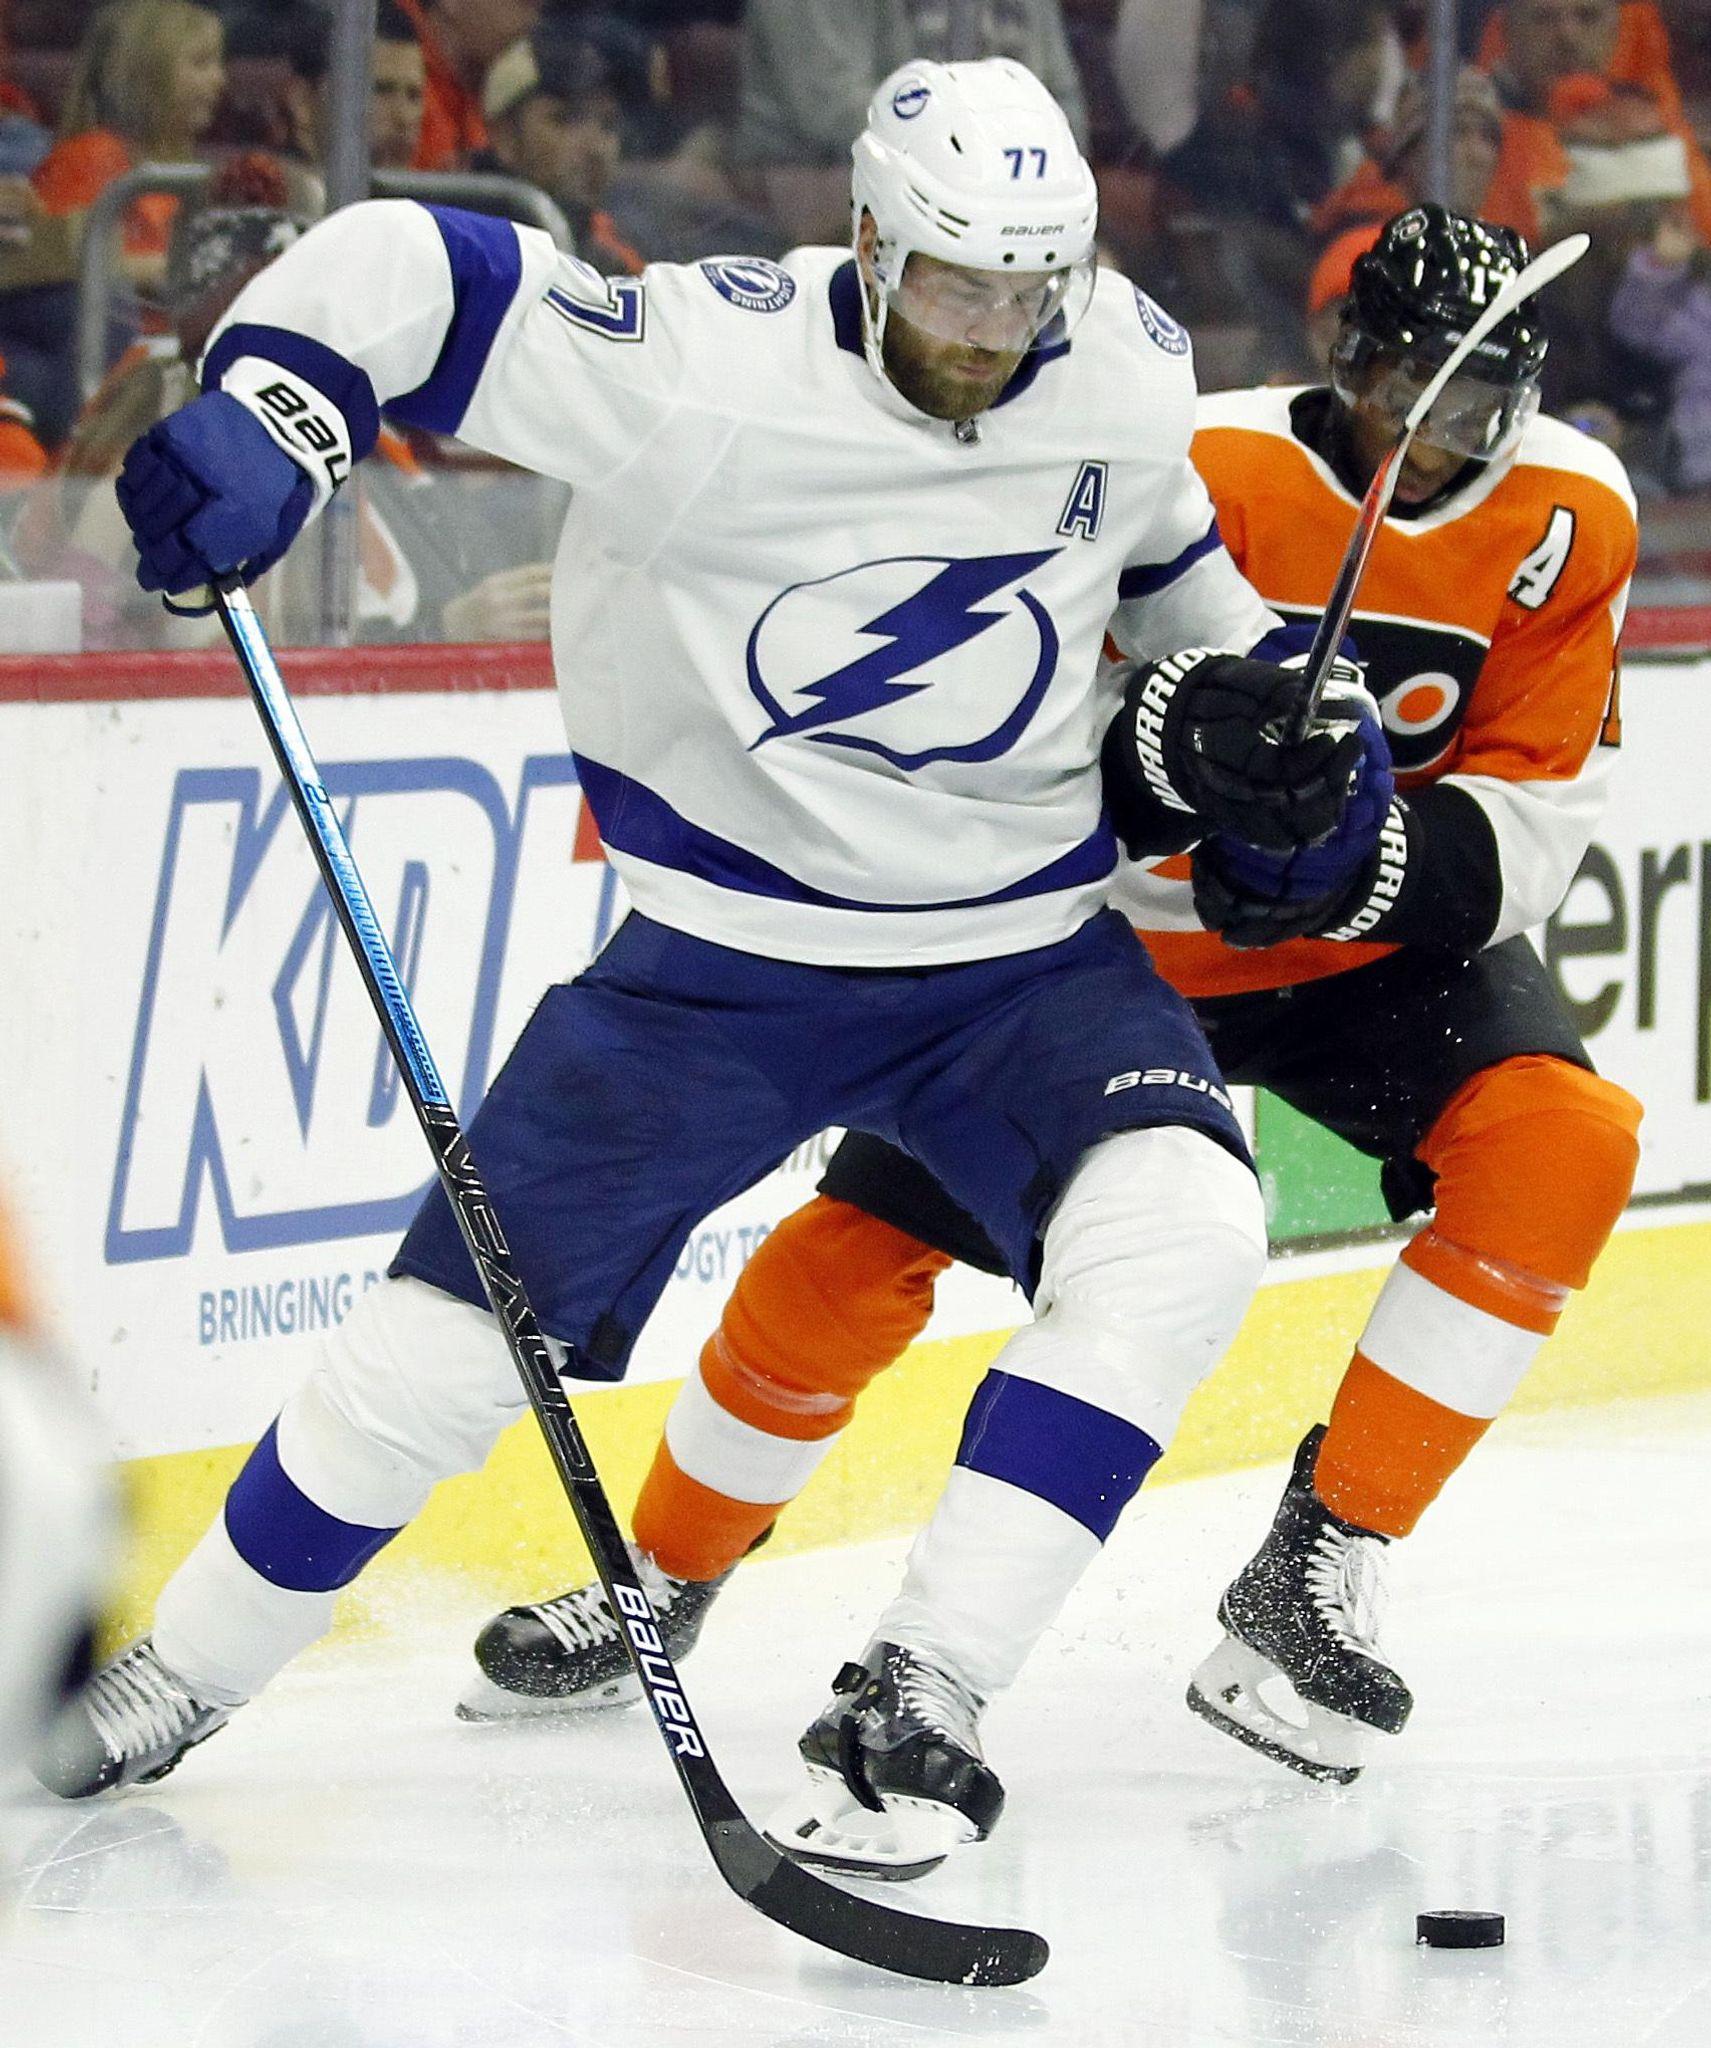 Lightning_flyers_hockey_21500_s1711x2048